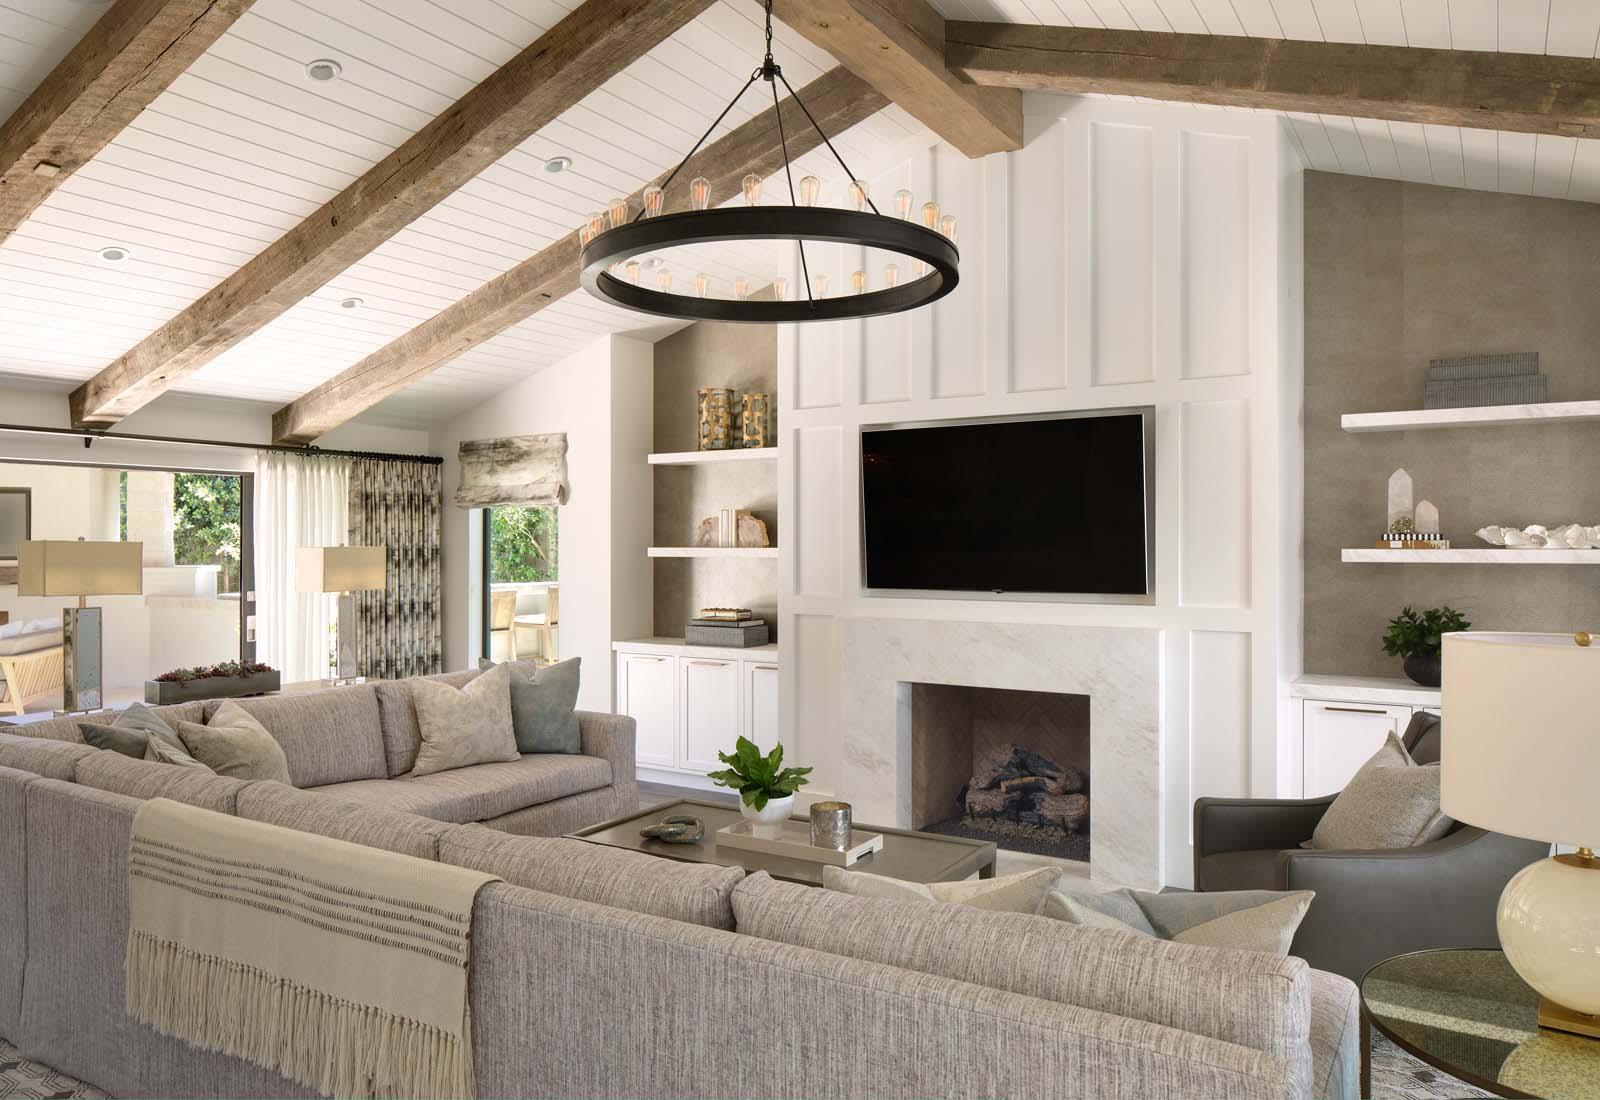 sawn hardwood beams09 - Reclaimed Hardwood Barn Timbers